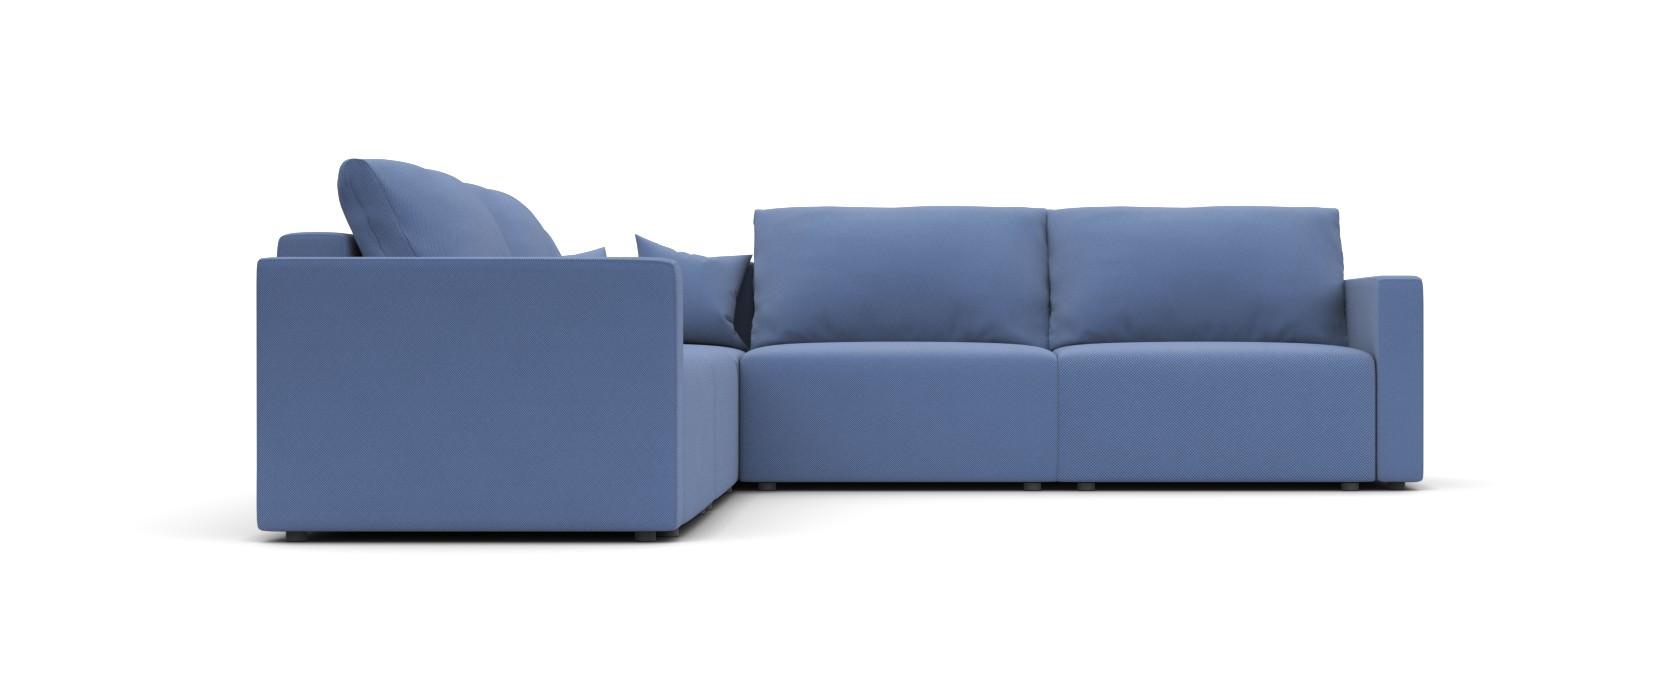 Модульний диван Greta 317x317 - Pufetto